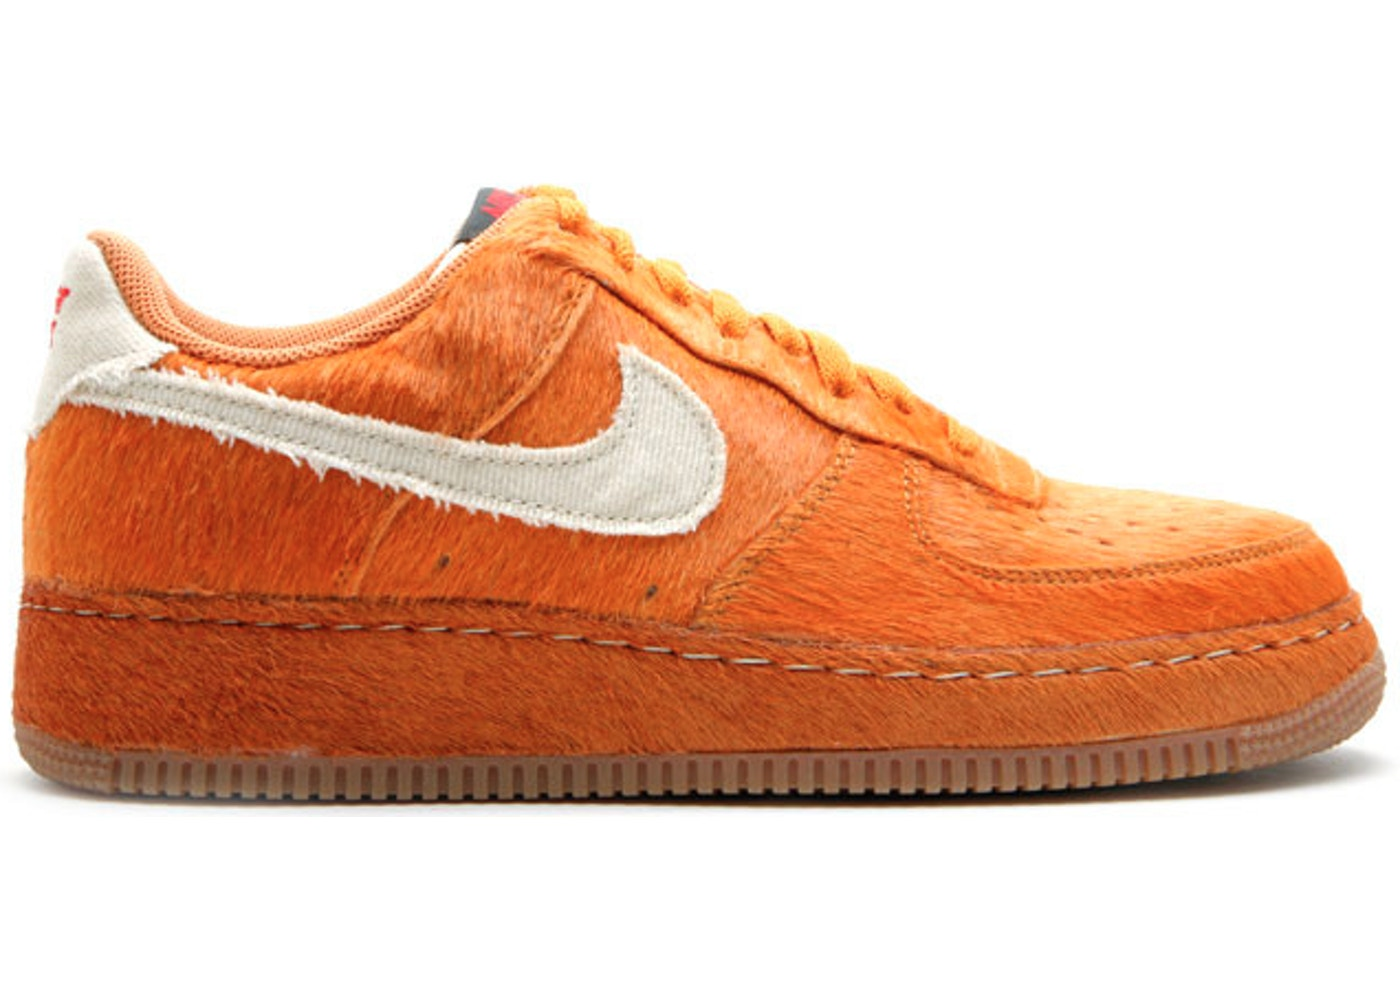 reputable site 55eaa a6de6 Nike Air Force Shoes - Price Premium